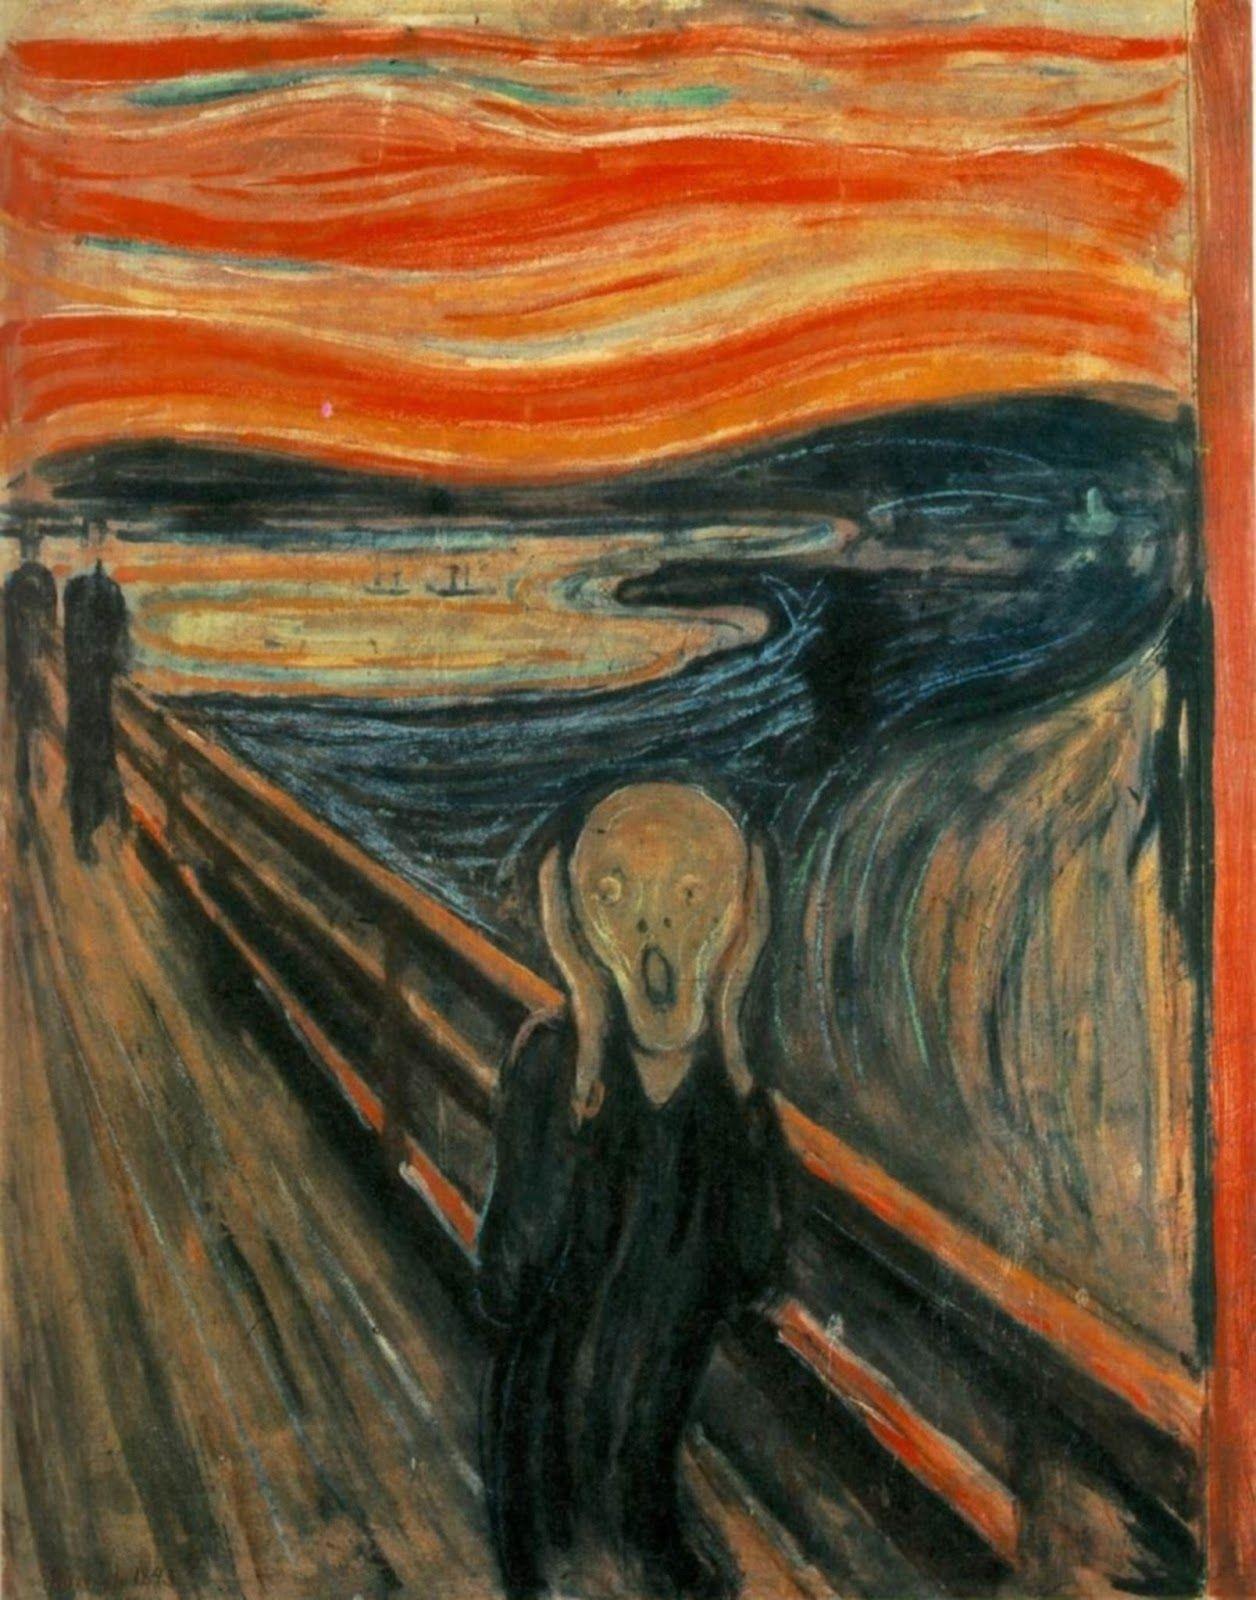 Figure 8. Edvard Munch, O grito (1898). Galeria Nacional, Oslo